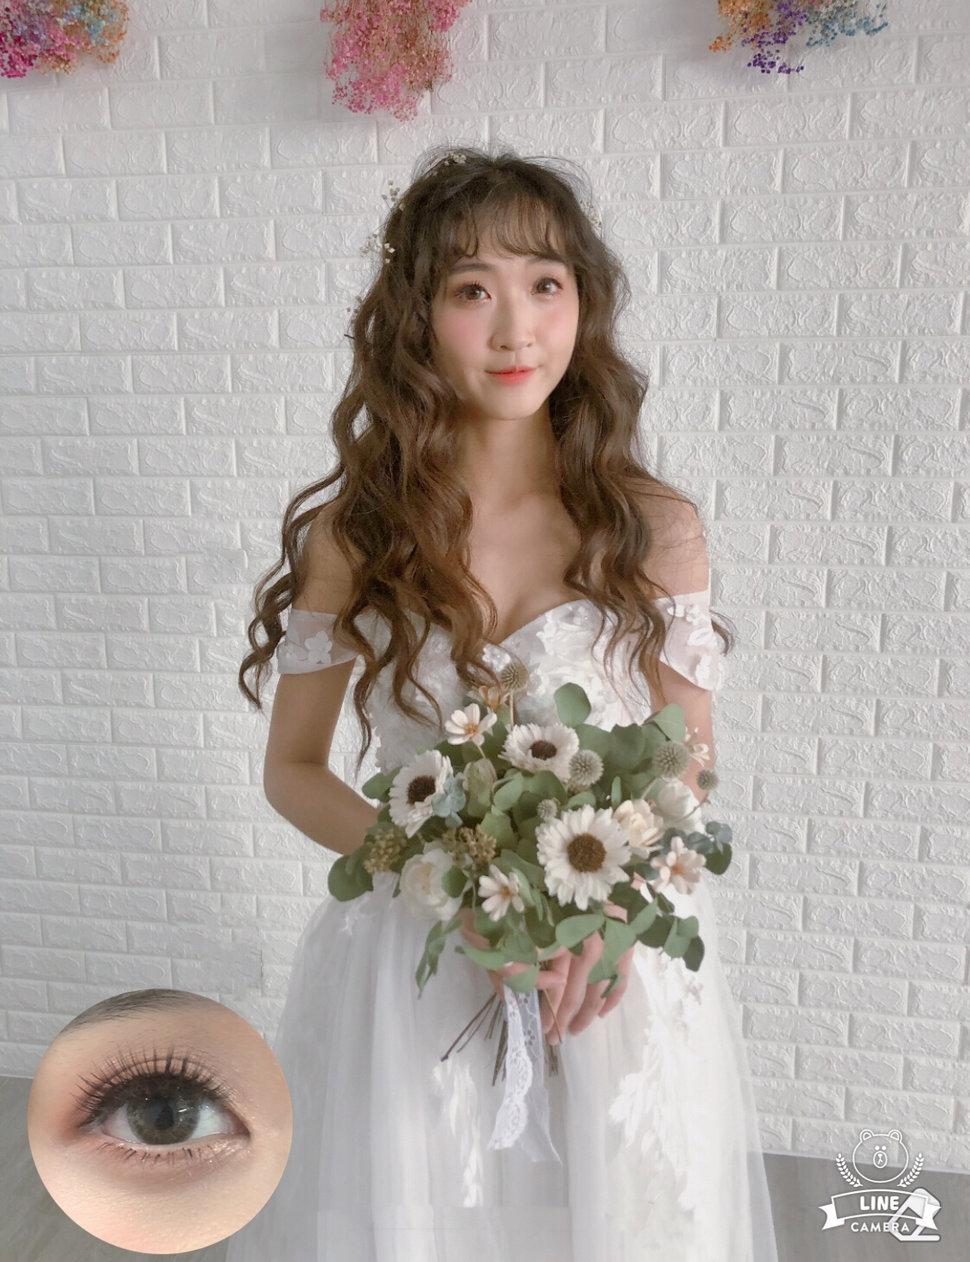 122FE23F-33B5-4573-8AB8-3F75718214EB - YI MO 米米 makeup Stud《結婚吧》